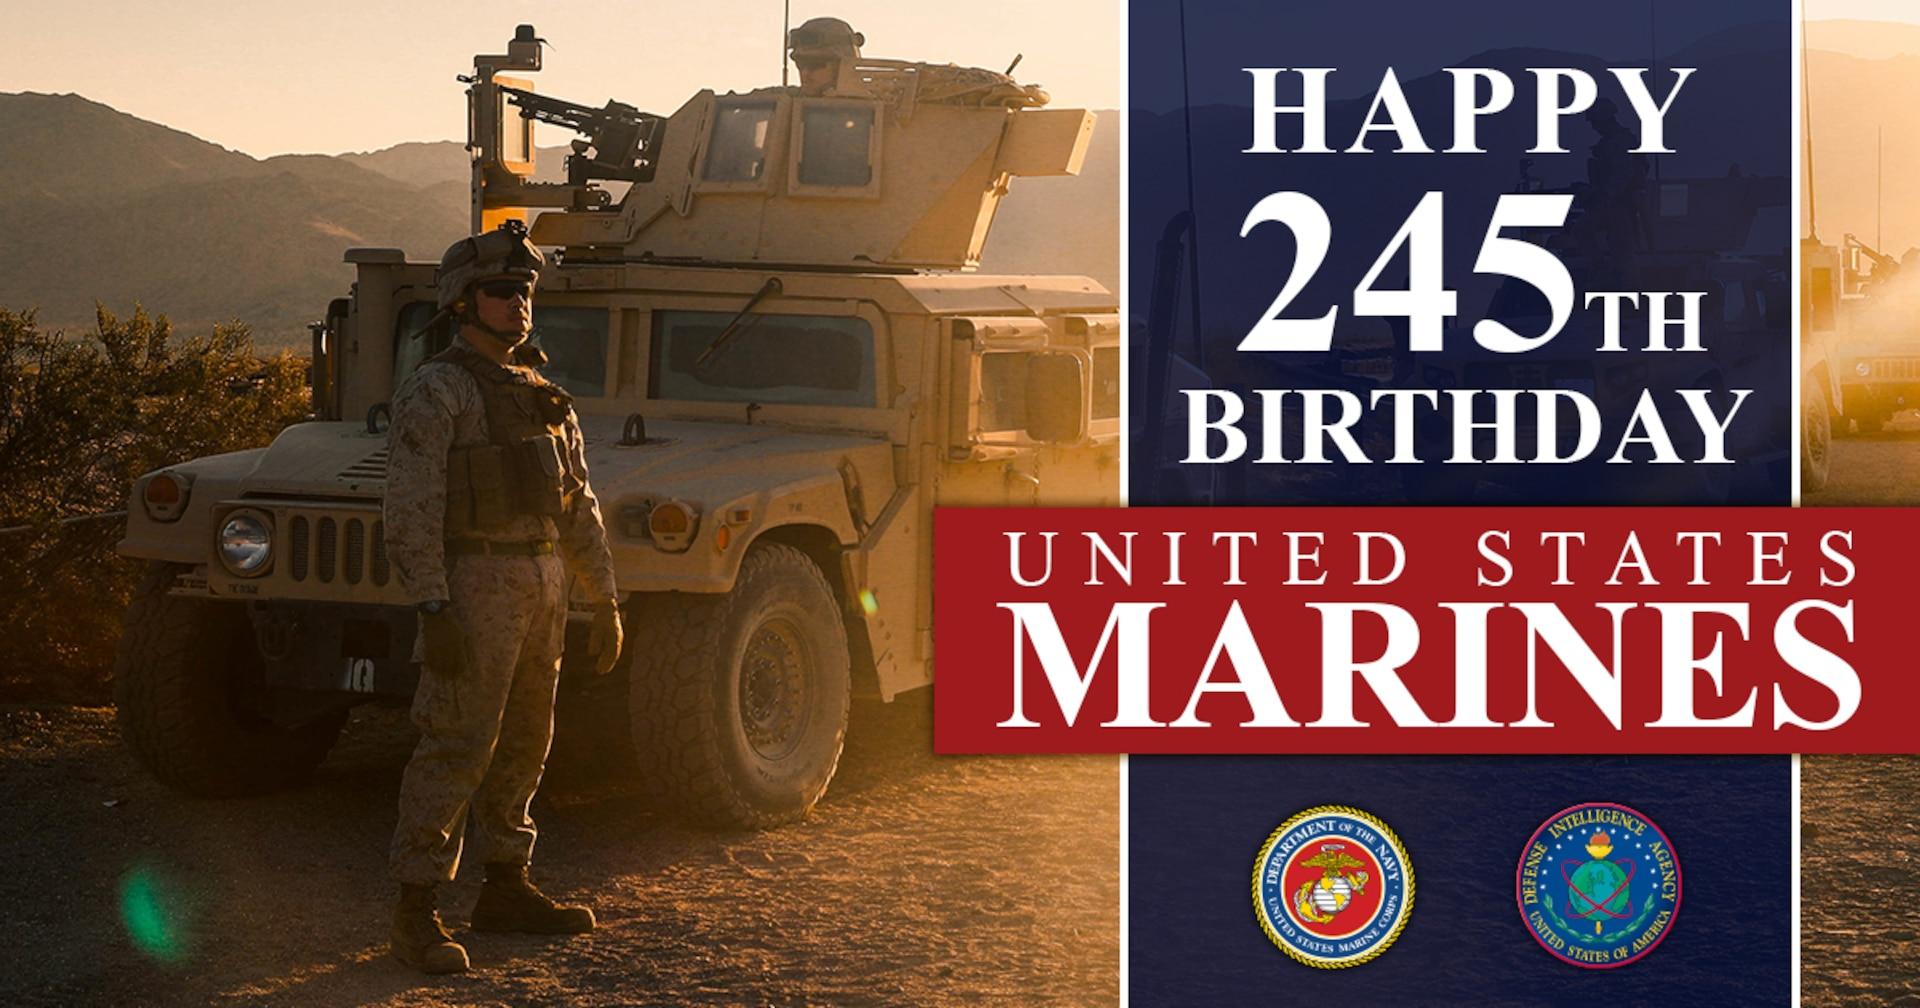 Happy 245th Birthday, United States Marines.